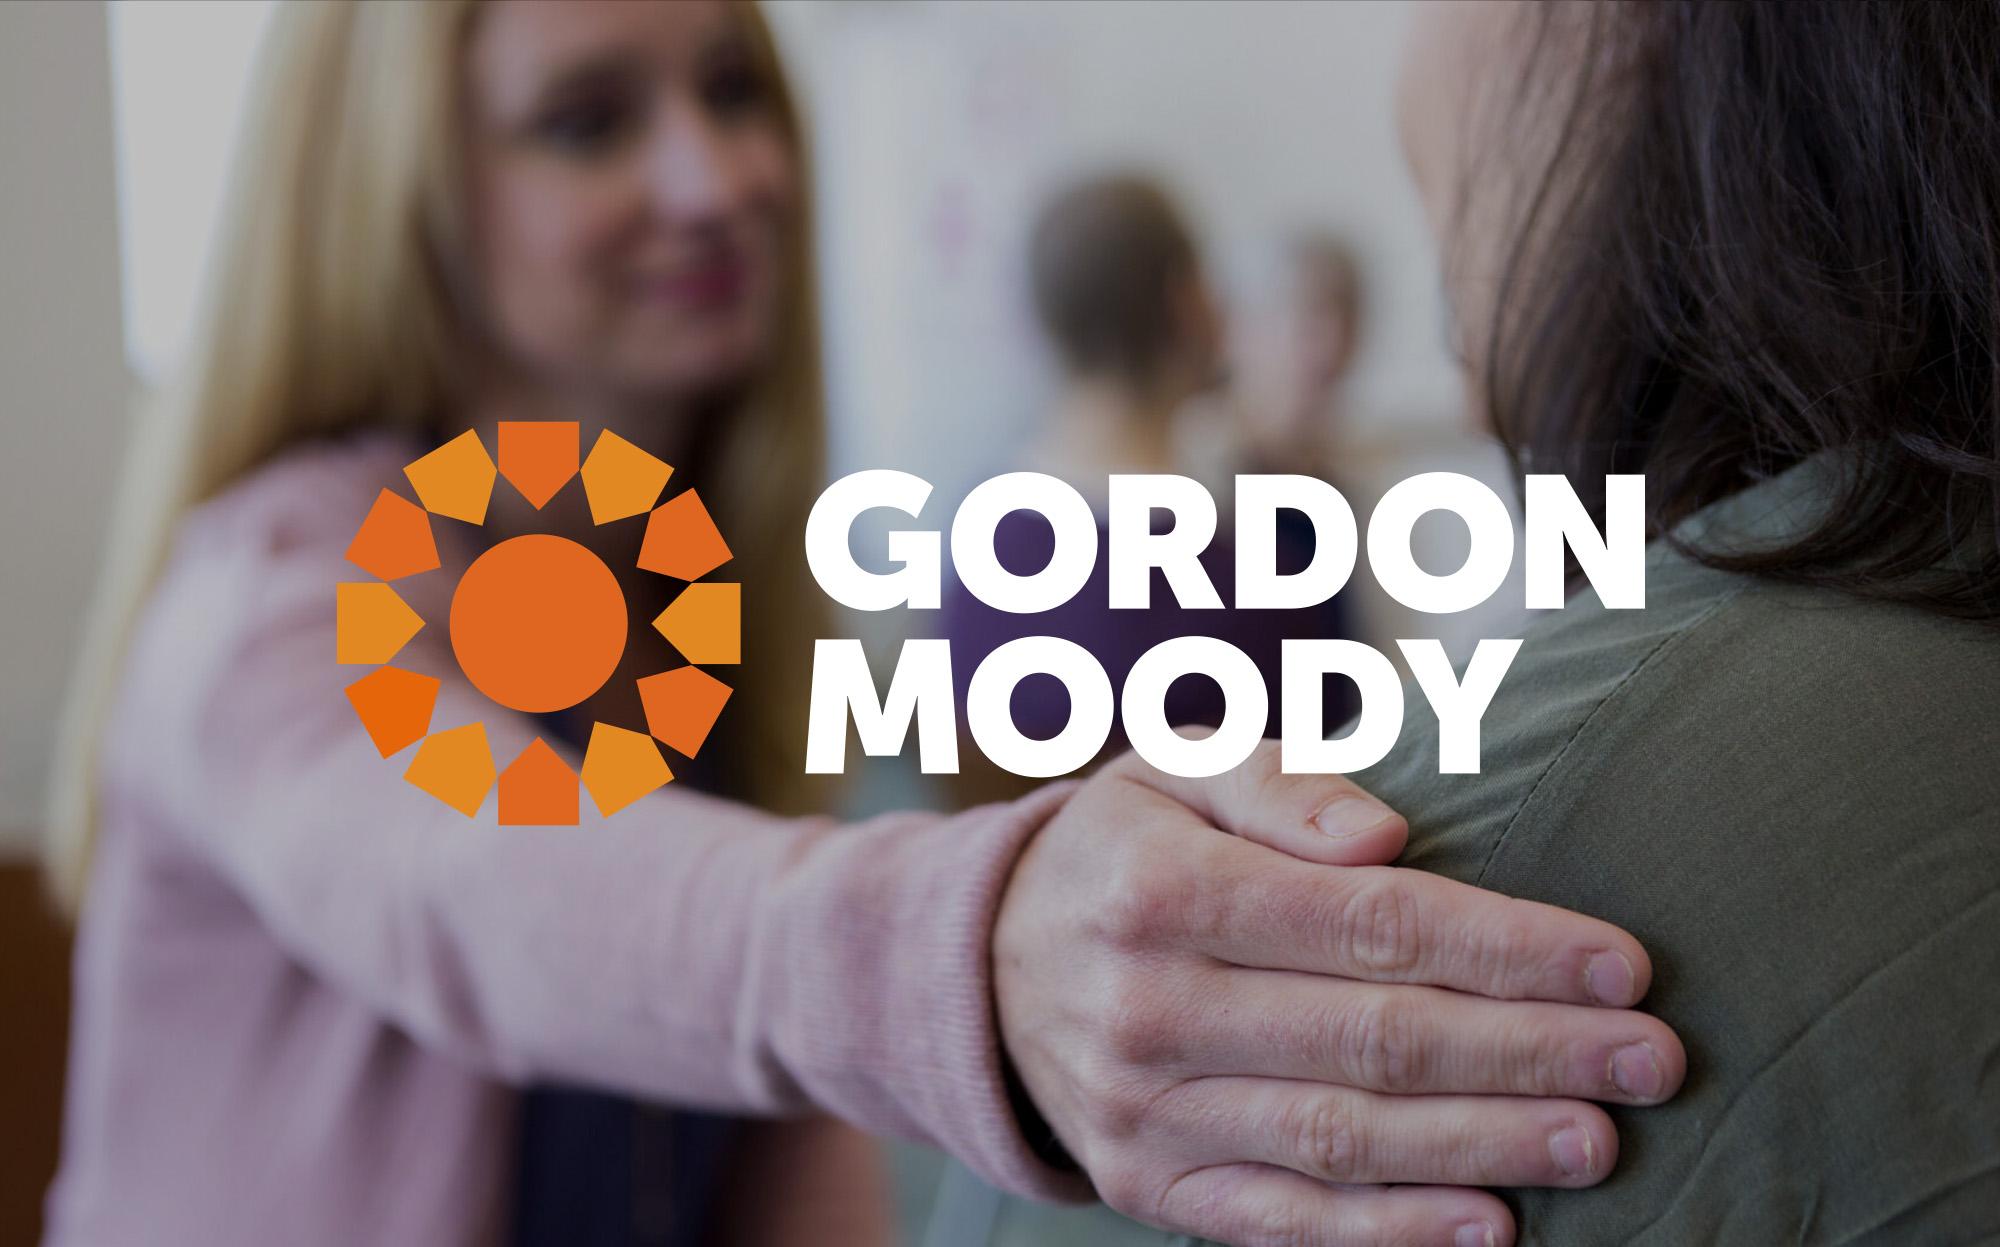 Gordon Moody